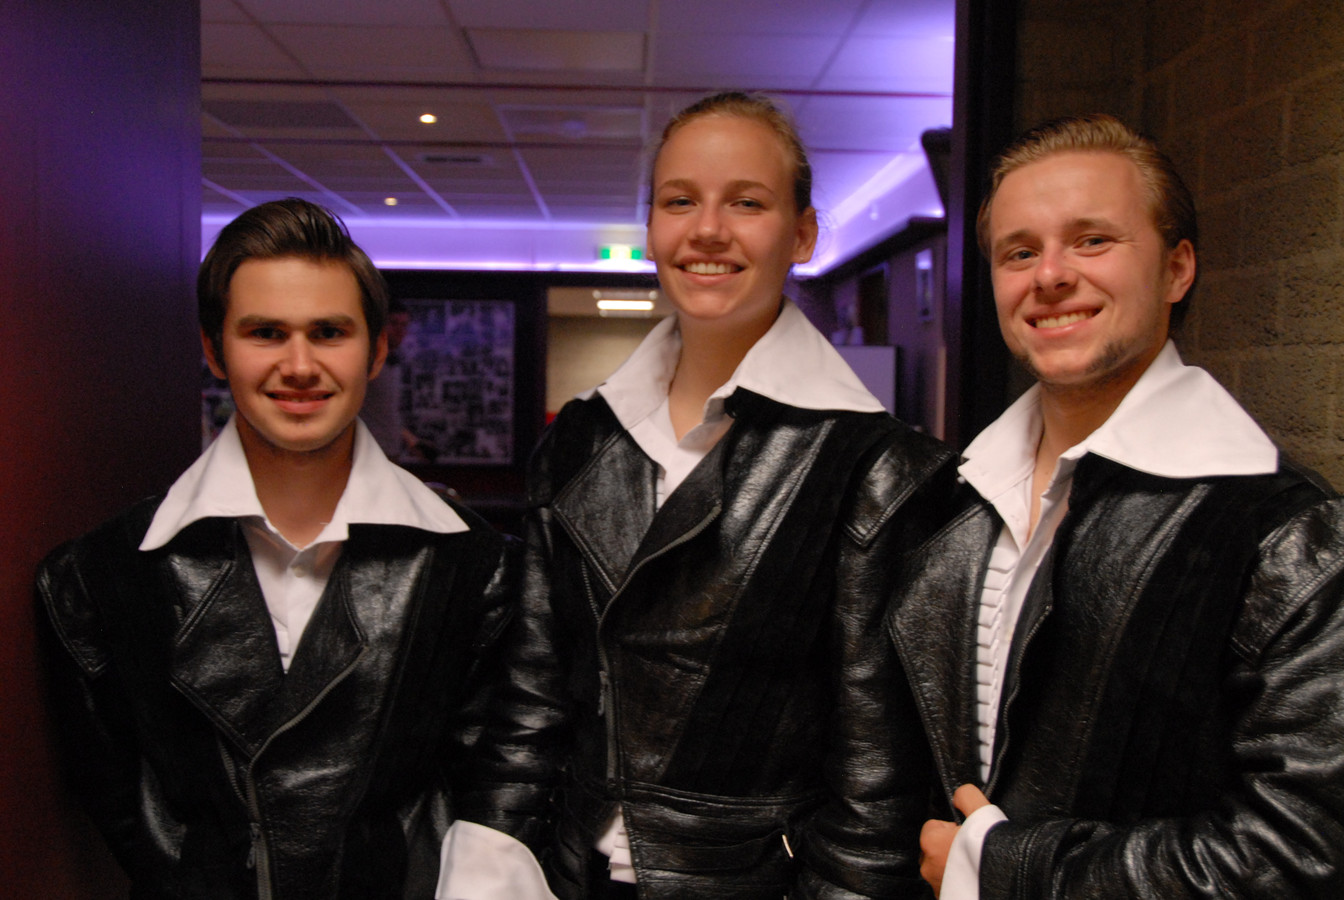 De Drie 'Van Maerlant' Musketiers: Davy Haagman, Marieke Leenheers en Thymen van Nuland.